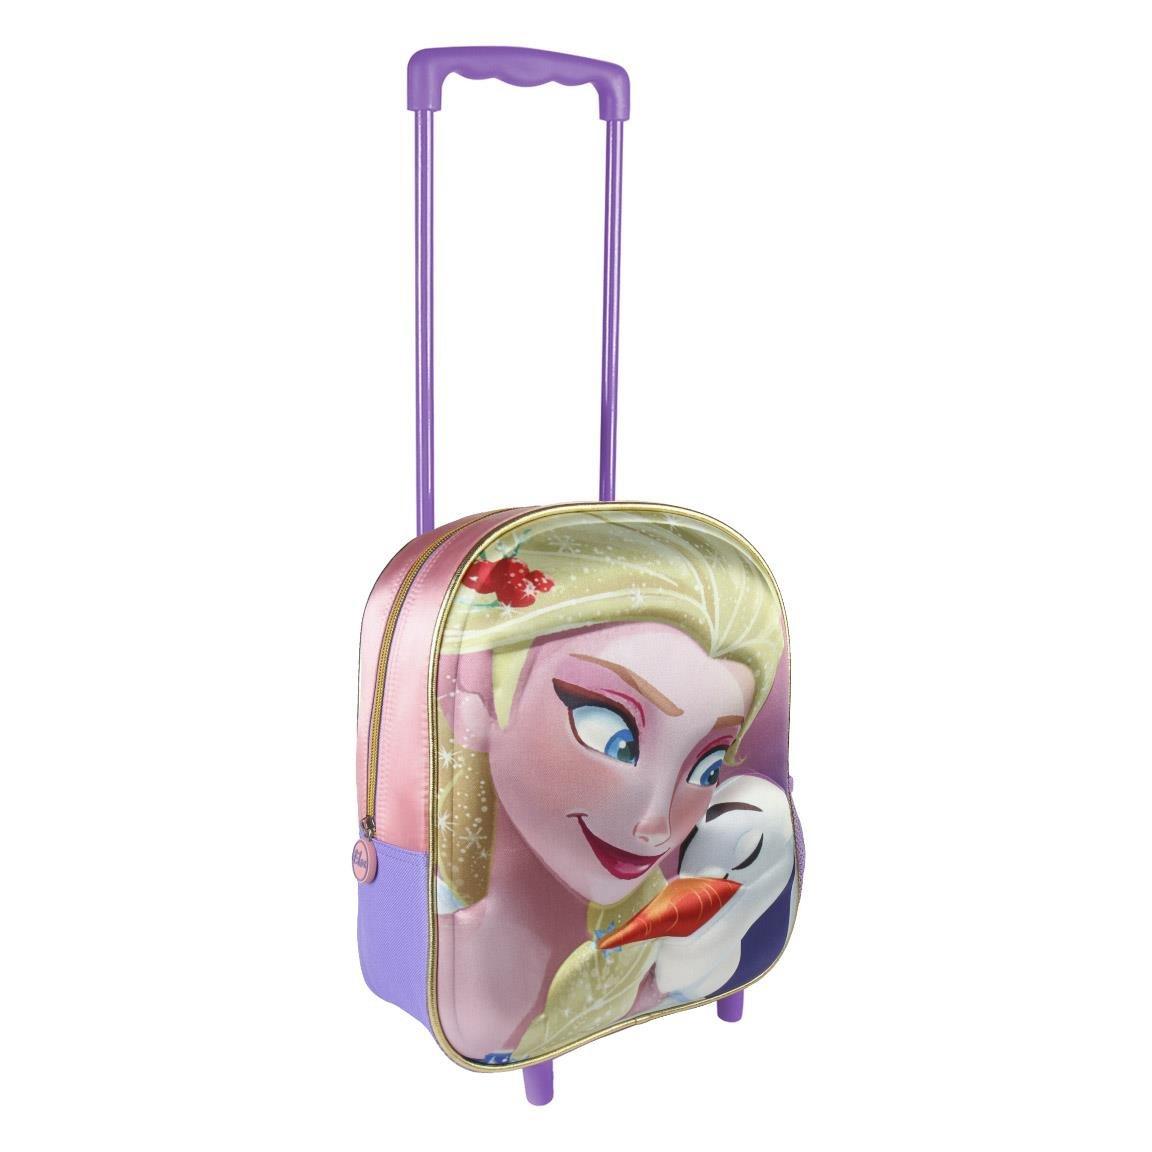 Disney Frozen 2100002104, Carrito Infantil, Effecto 3D, 31 cm, Multicolor: Amazon.es: Equipaje